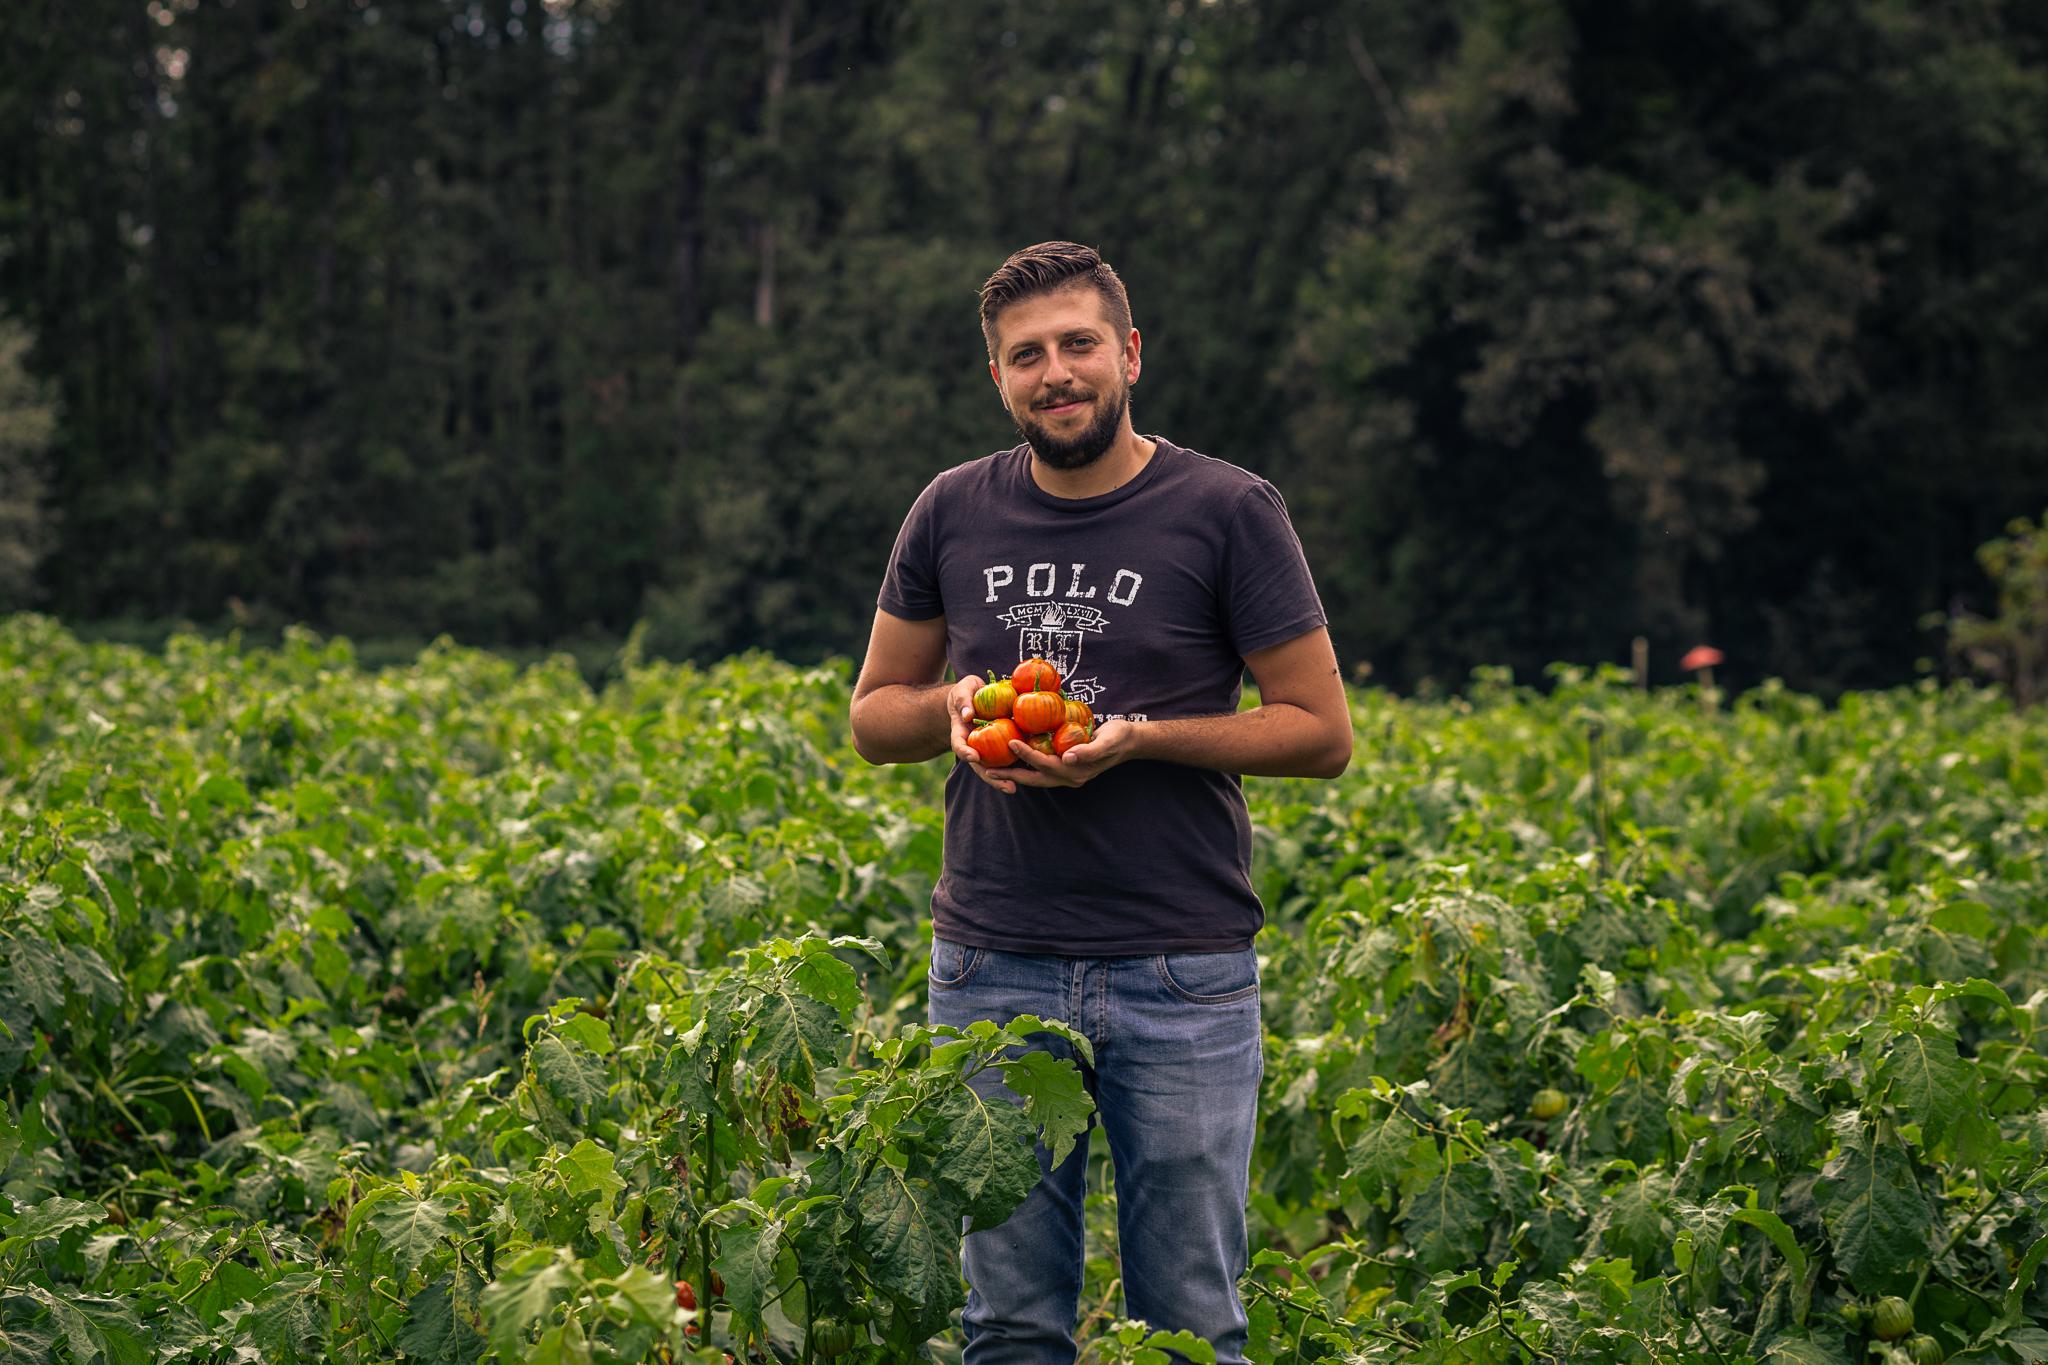 Landwirt Fortunato Caruso baut die Melanzana rossa di Rotonda an. Kalabrien.